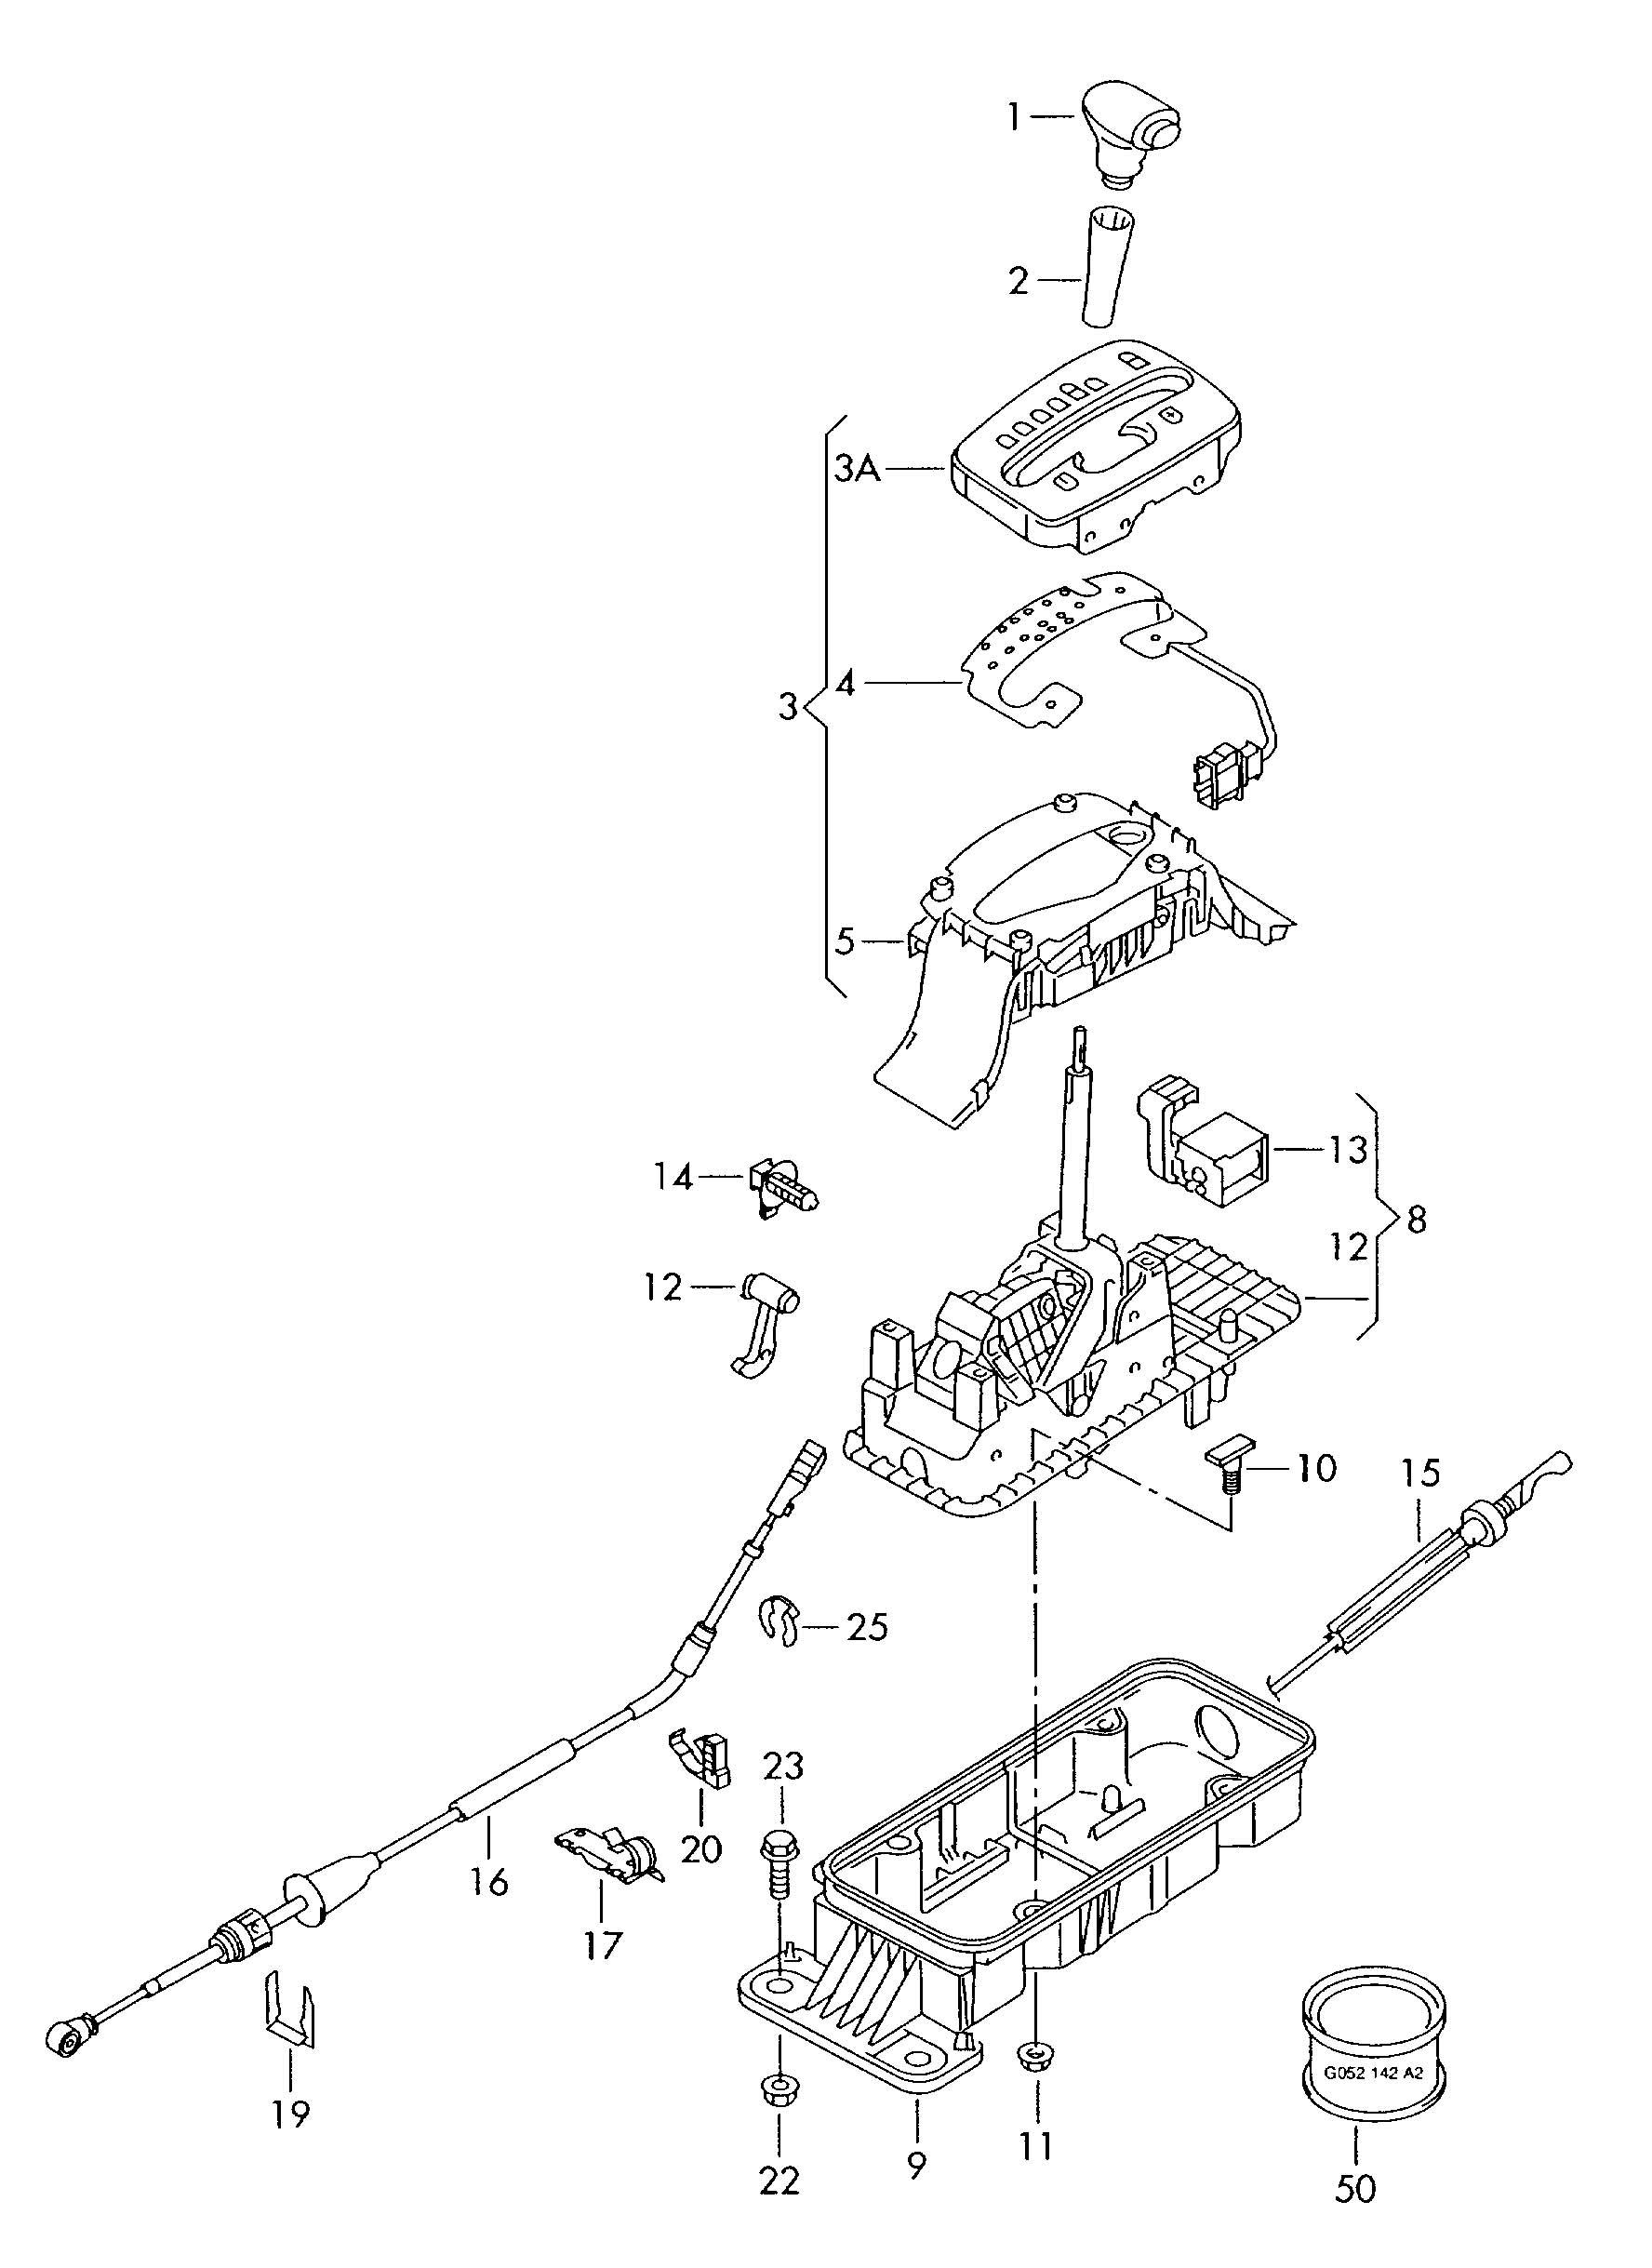 Volkswagen New Beetle Shift mechanism for vehicles with